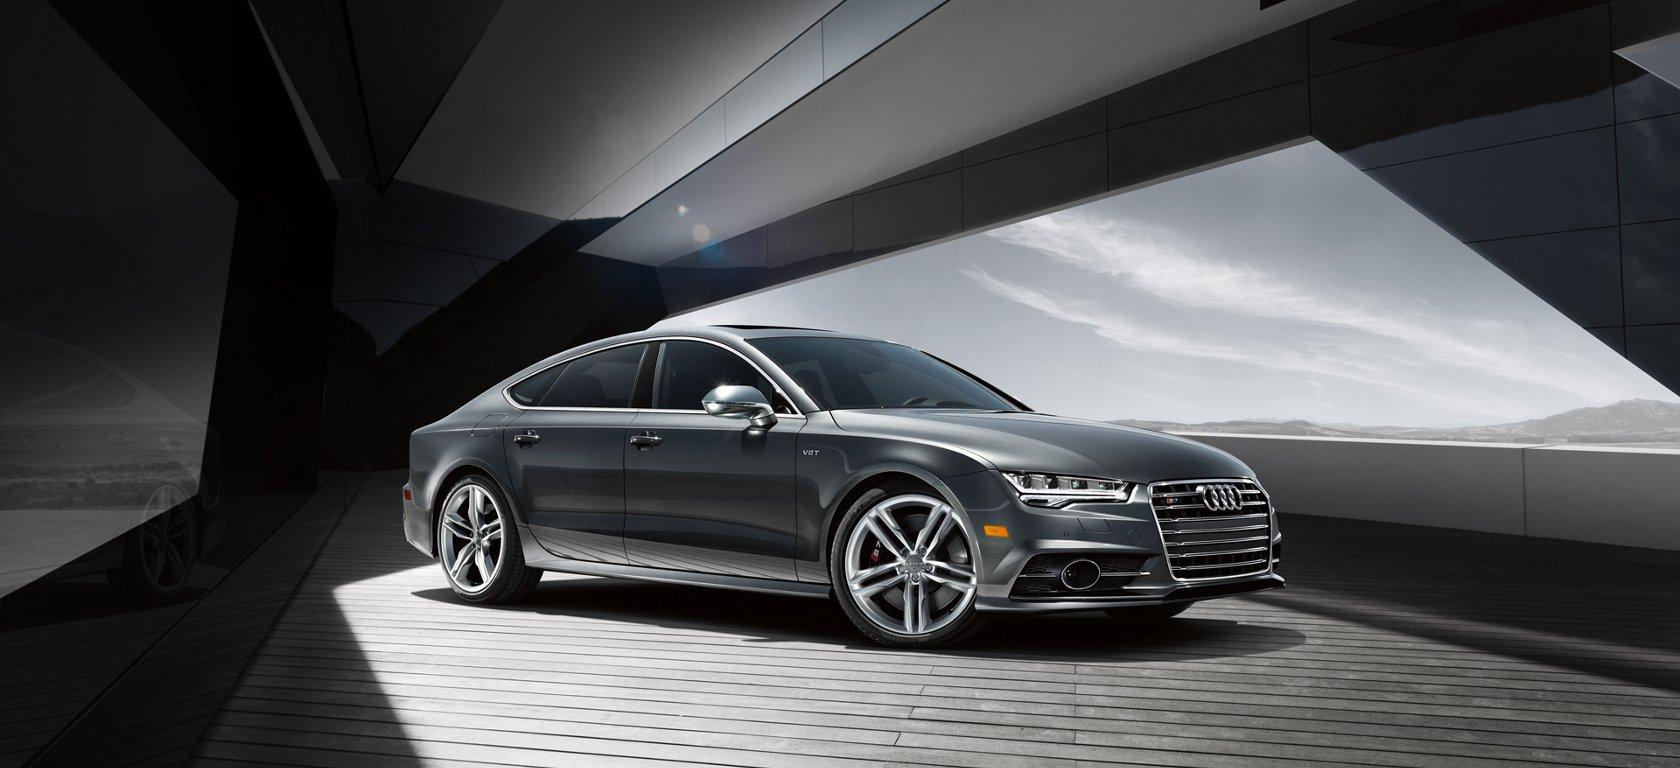 New Audi S7 Exterior main image